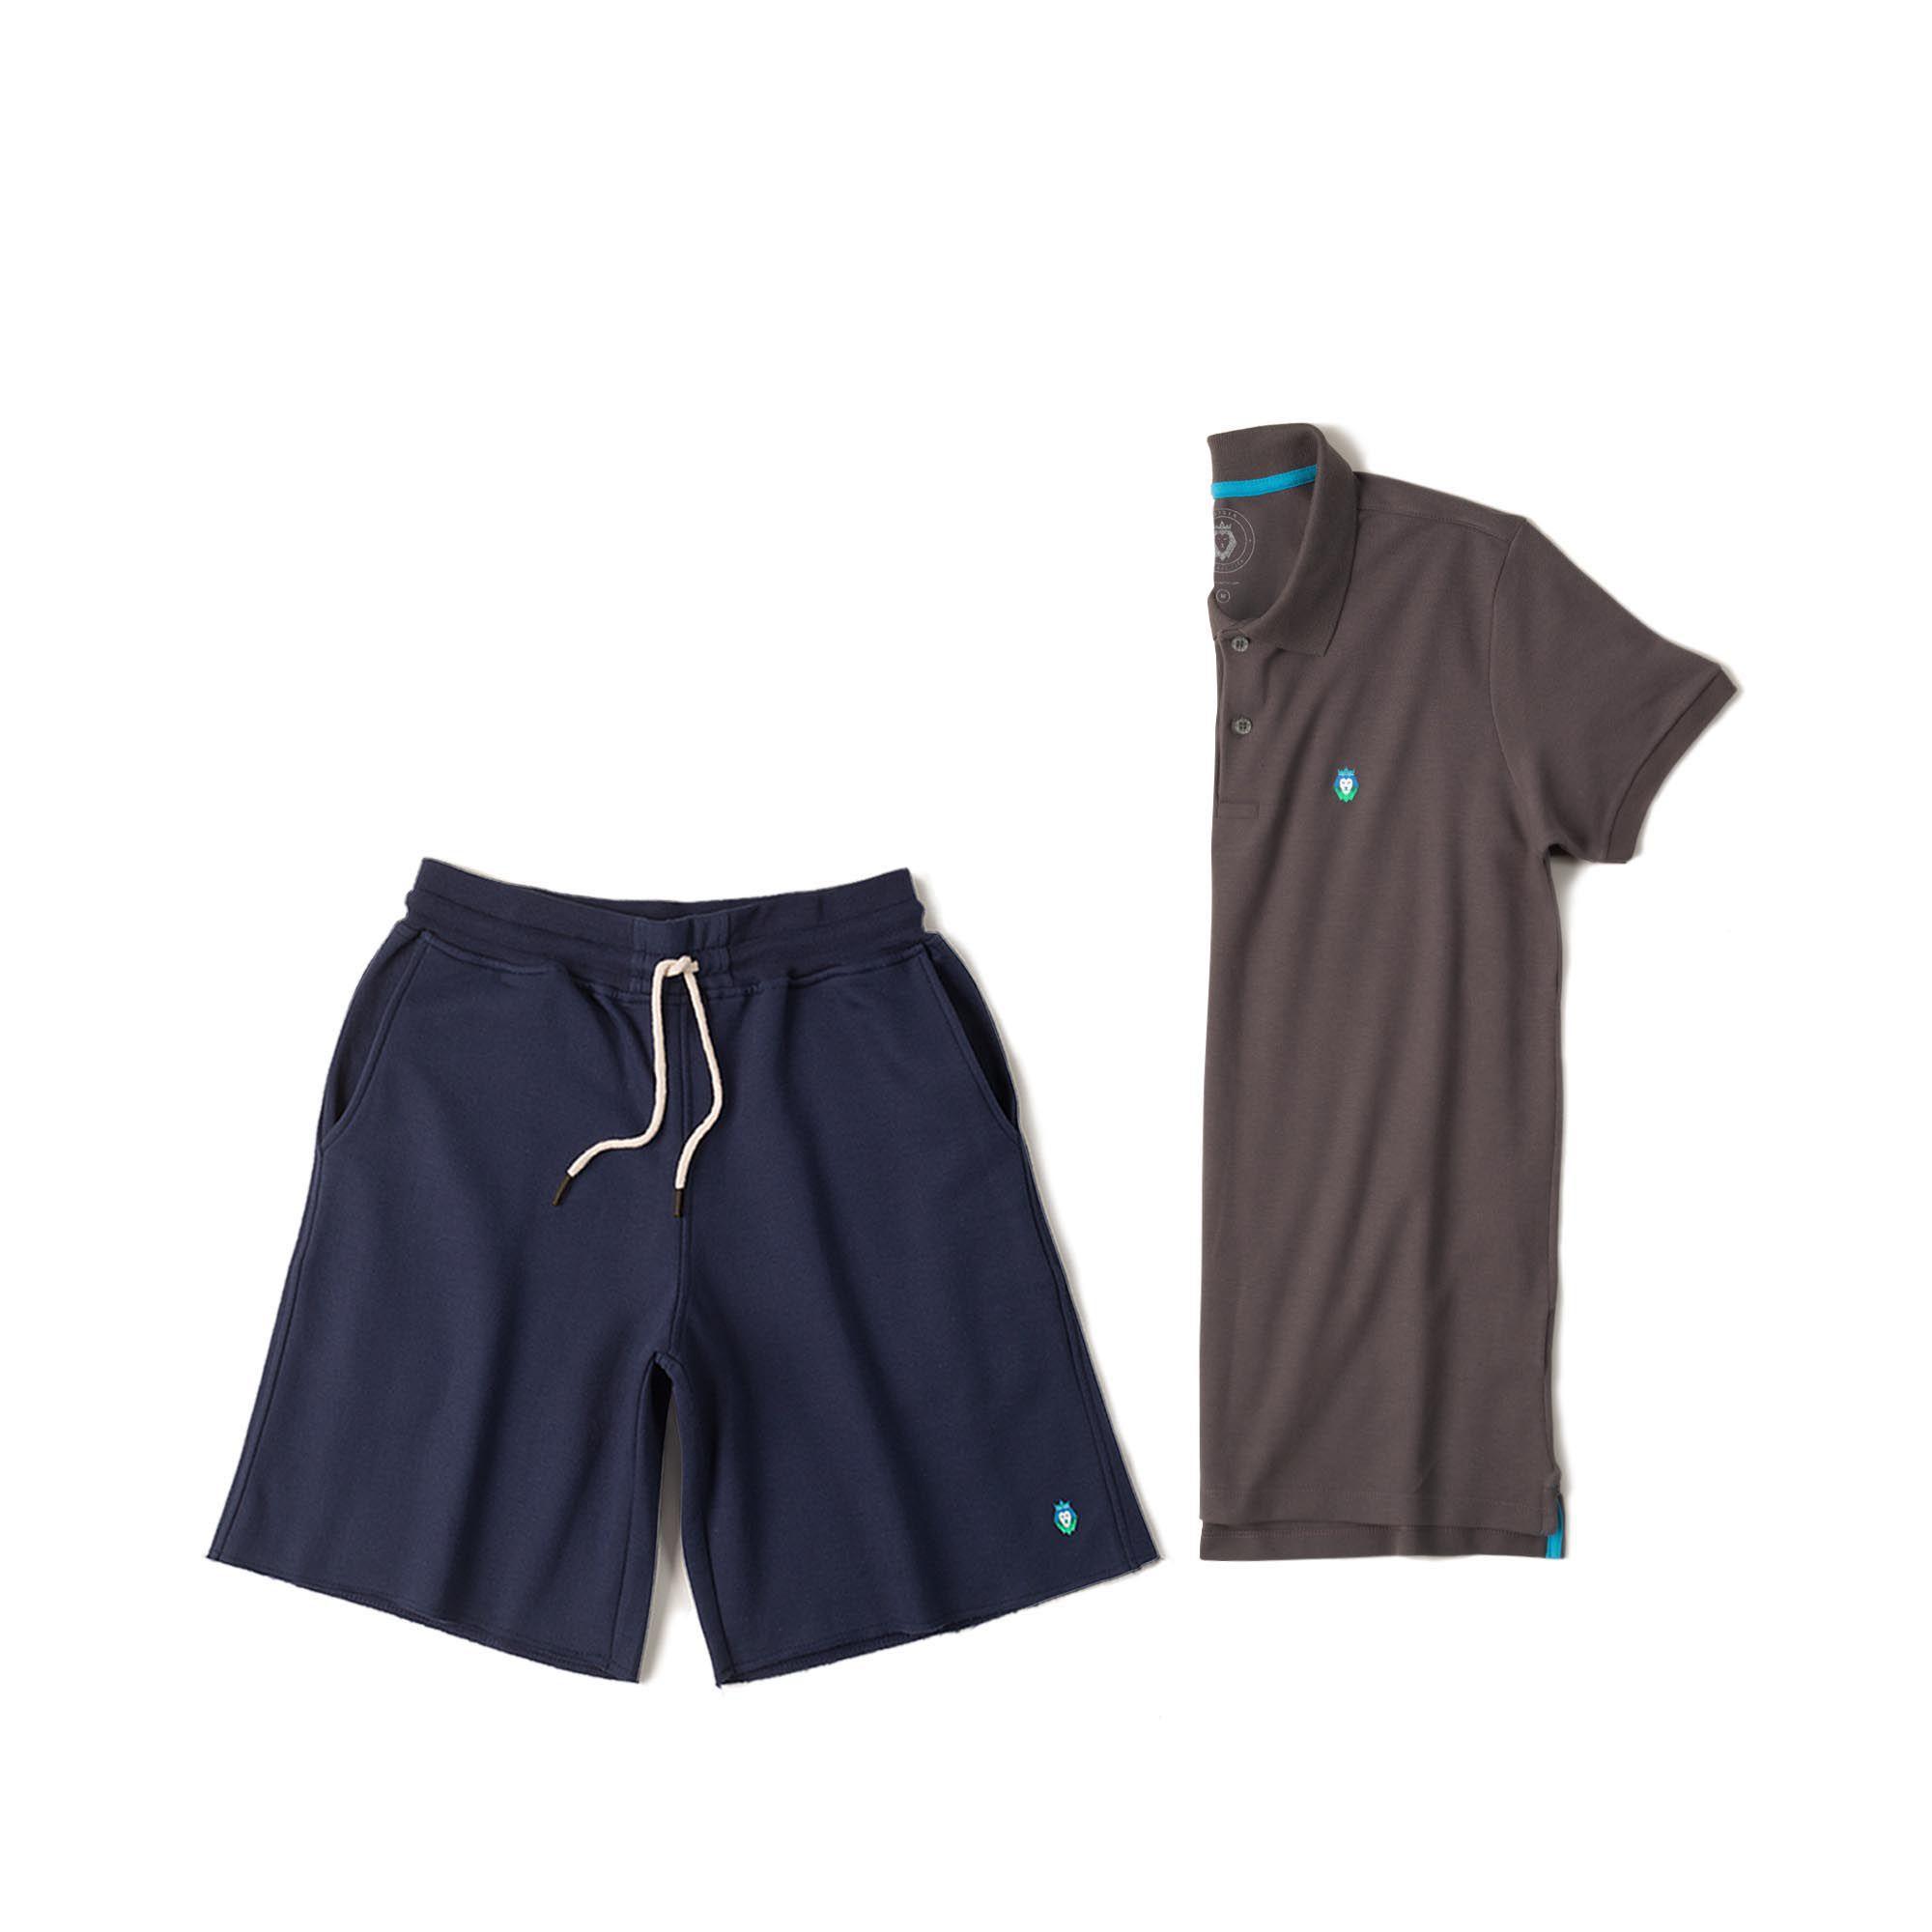 Kit 1 Bermuda Basic Azul Marinho + 1 Camisa Polo Style Cinza Zaiden Masculina